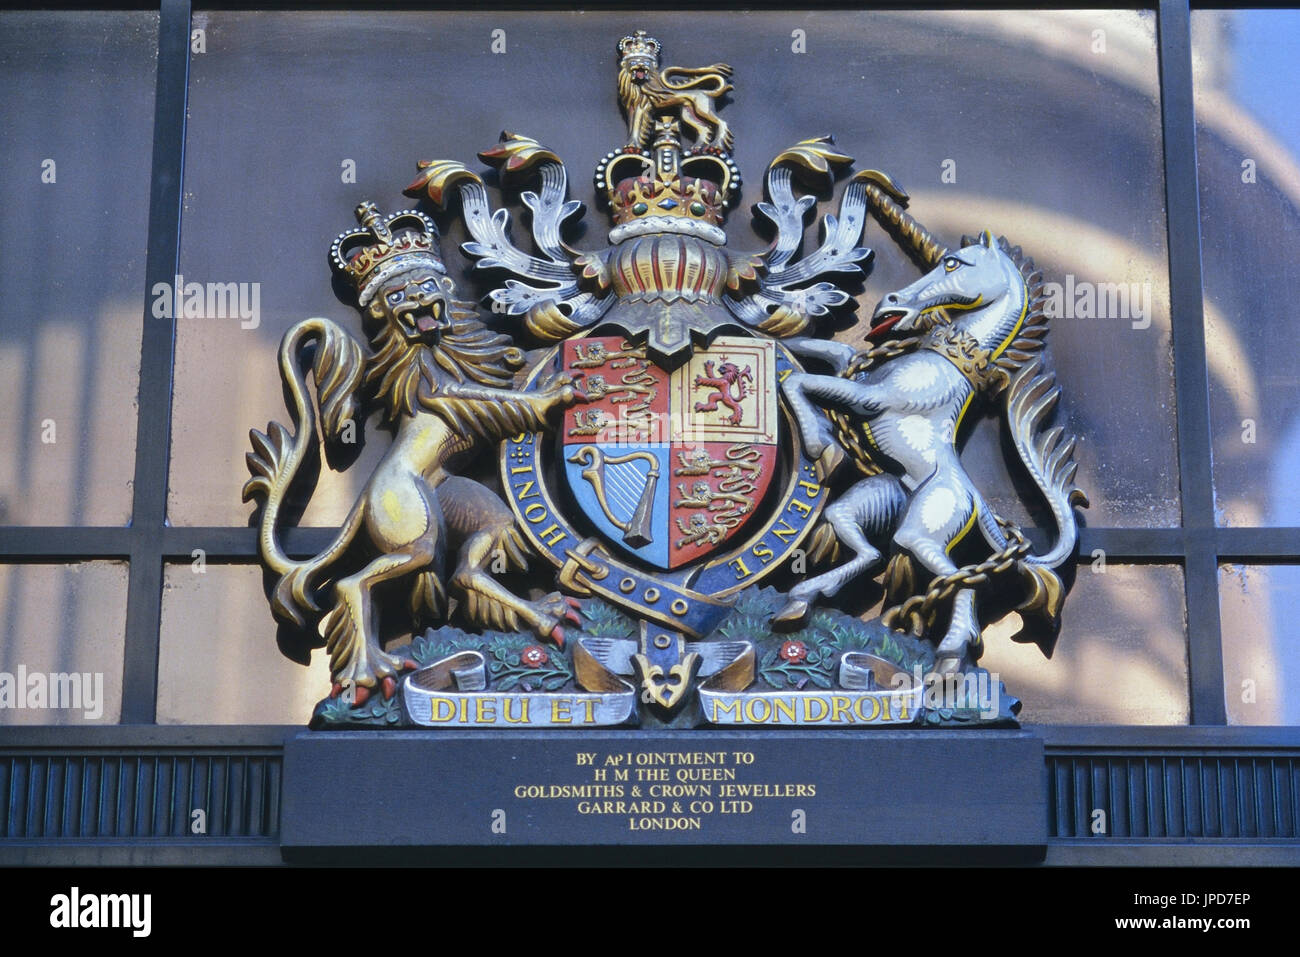 The old Royal Warrant of Garrard & Co as crown jeweller, Mayfair, London, England, UK. Circa 1980s - Stock Image